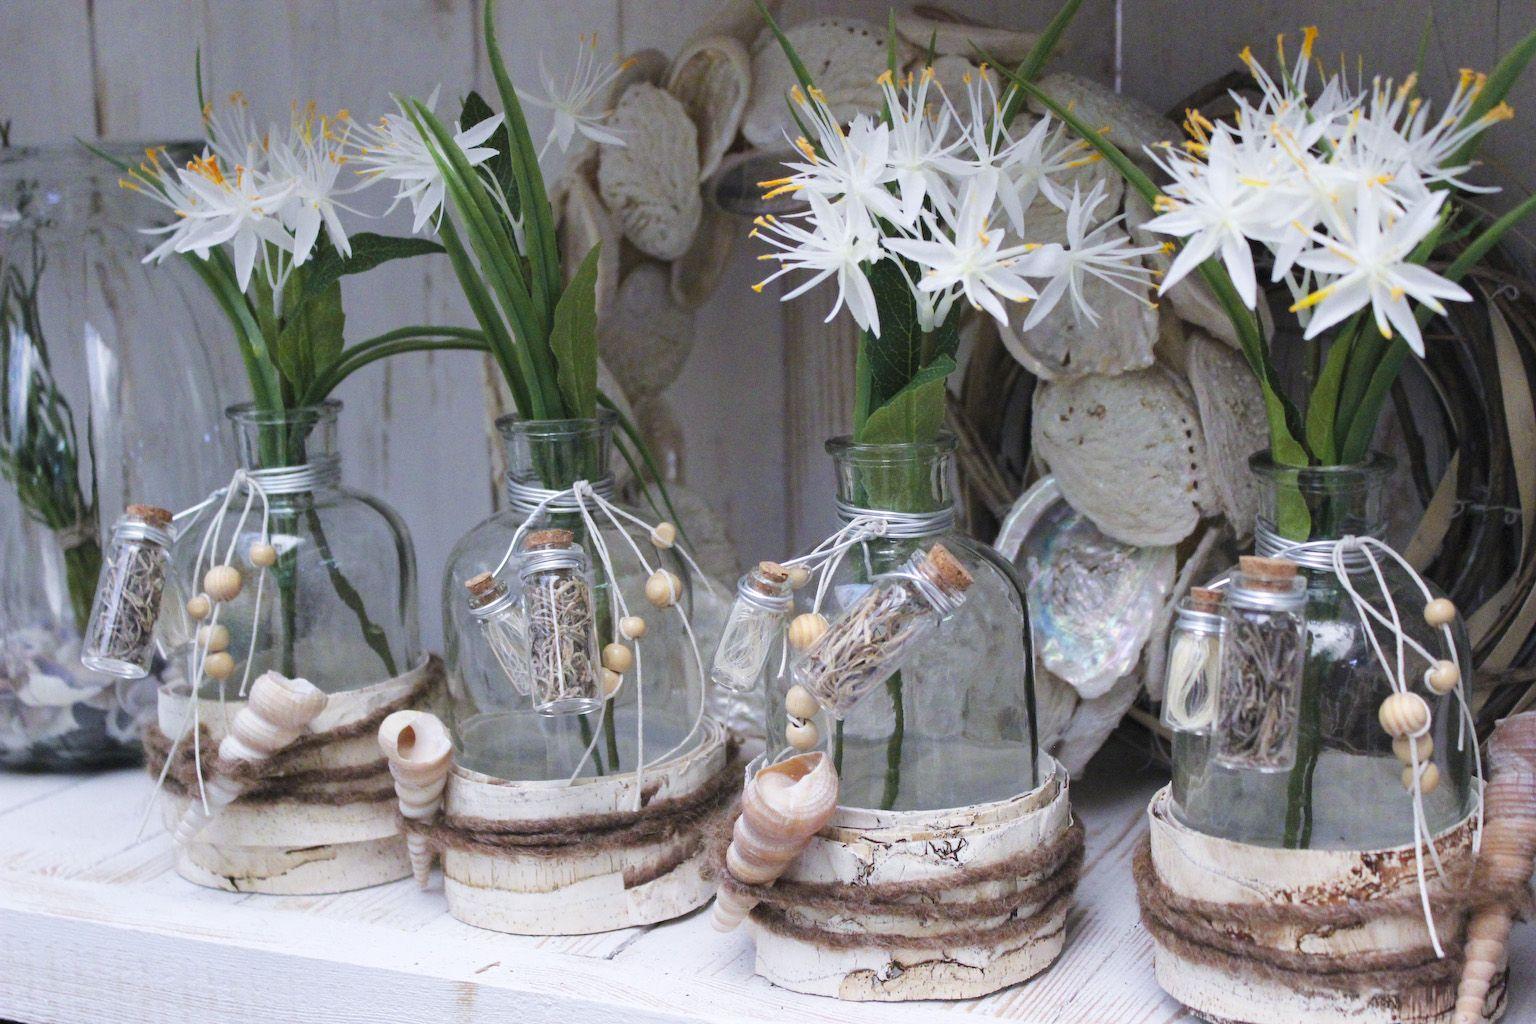 Maritime Tischdeko Blumen Konfirmasjon Wedding Pinterest Tischdeko